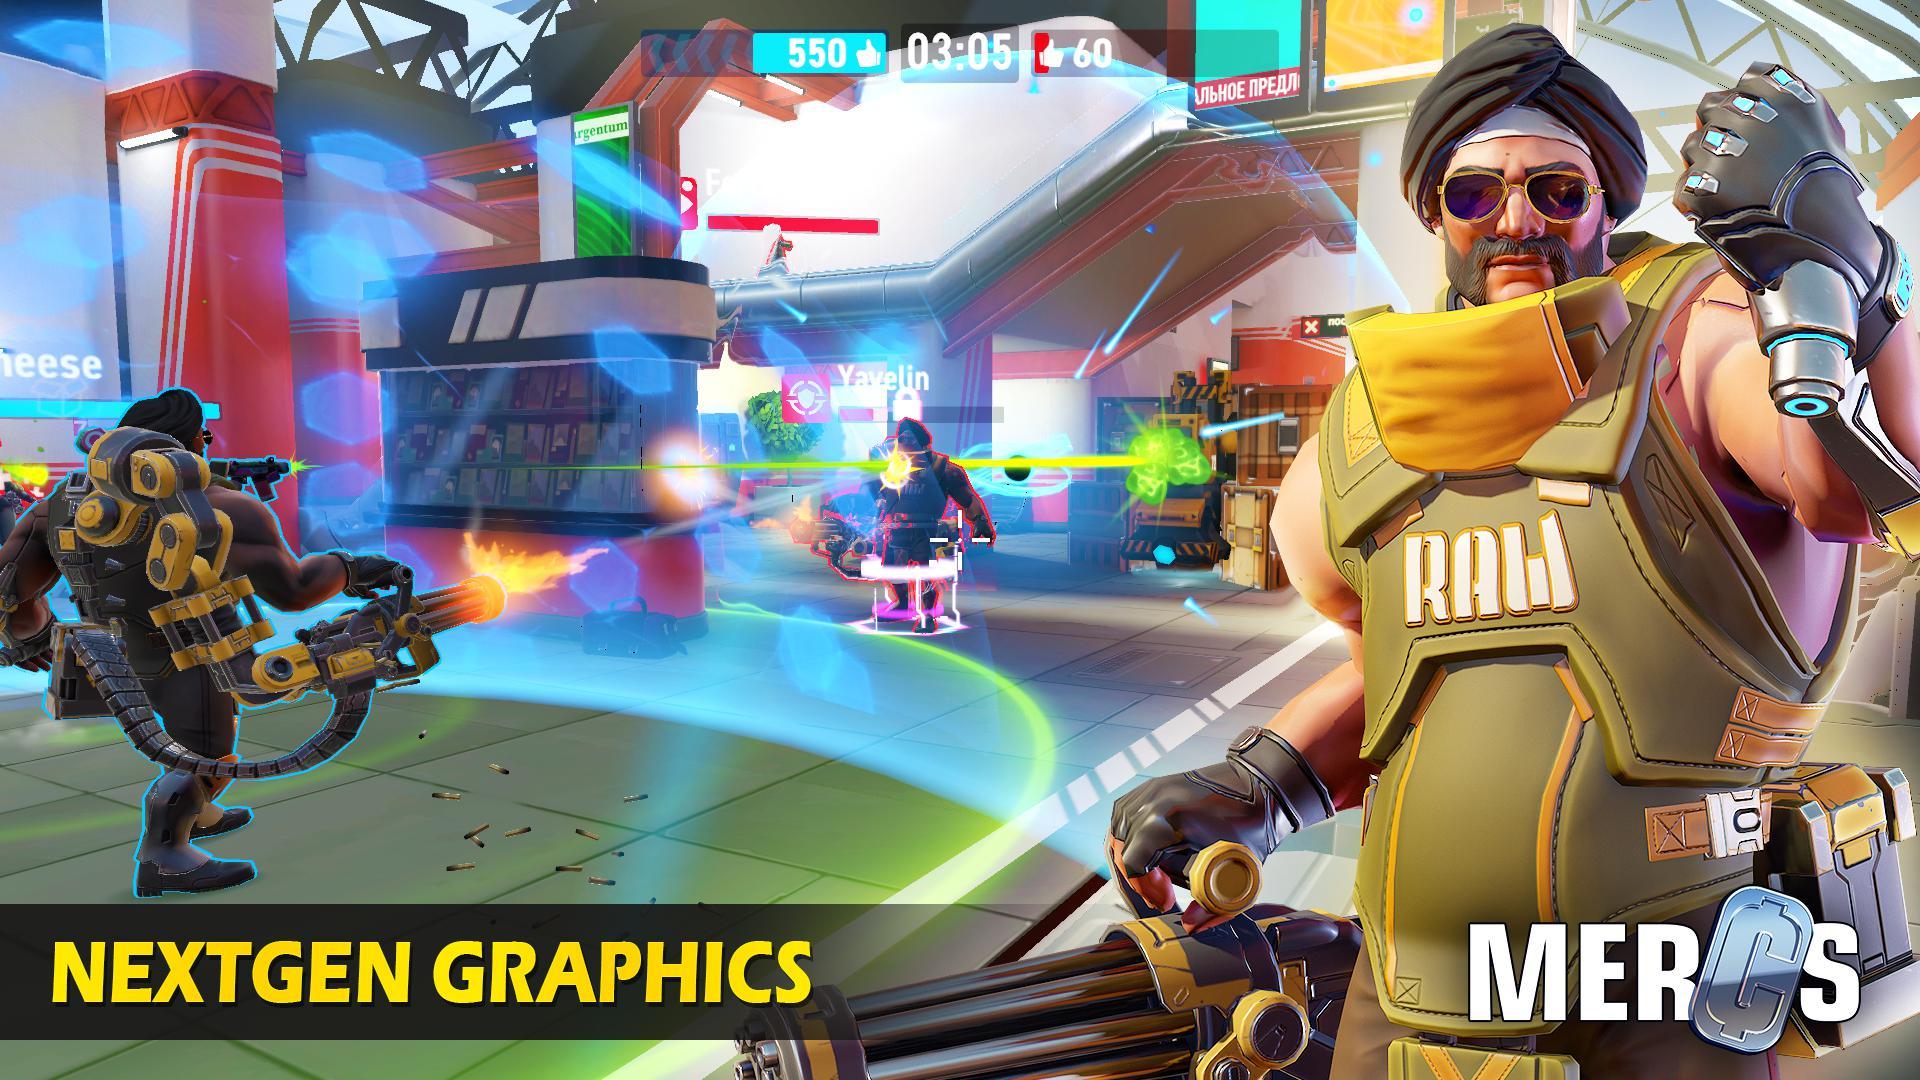 MERCS - Cyber strike arena. Multiplayer shooter! 游戏截图4